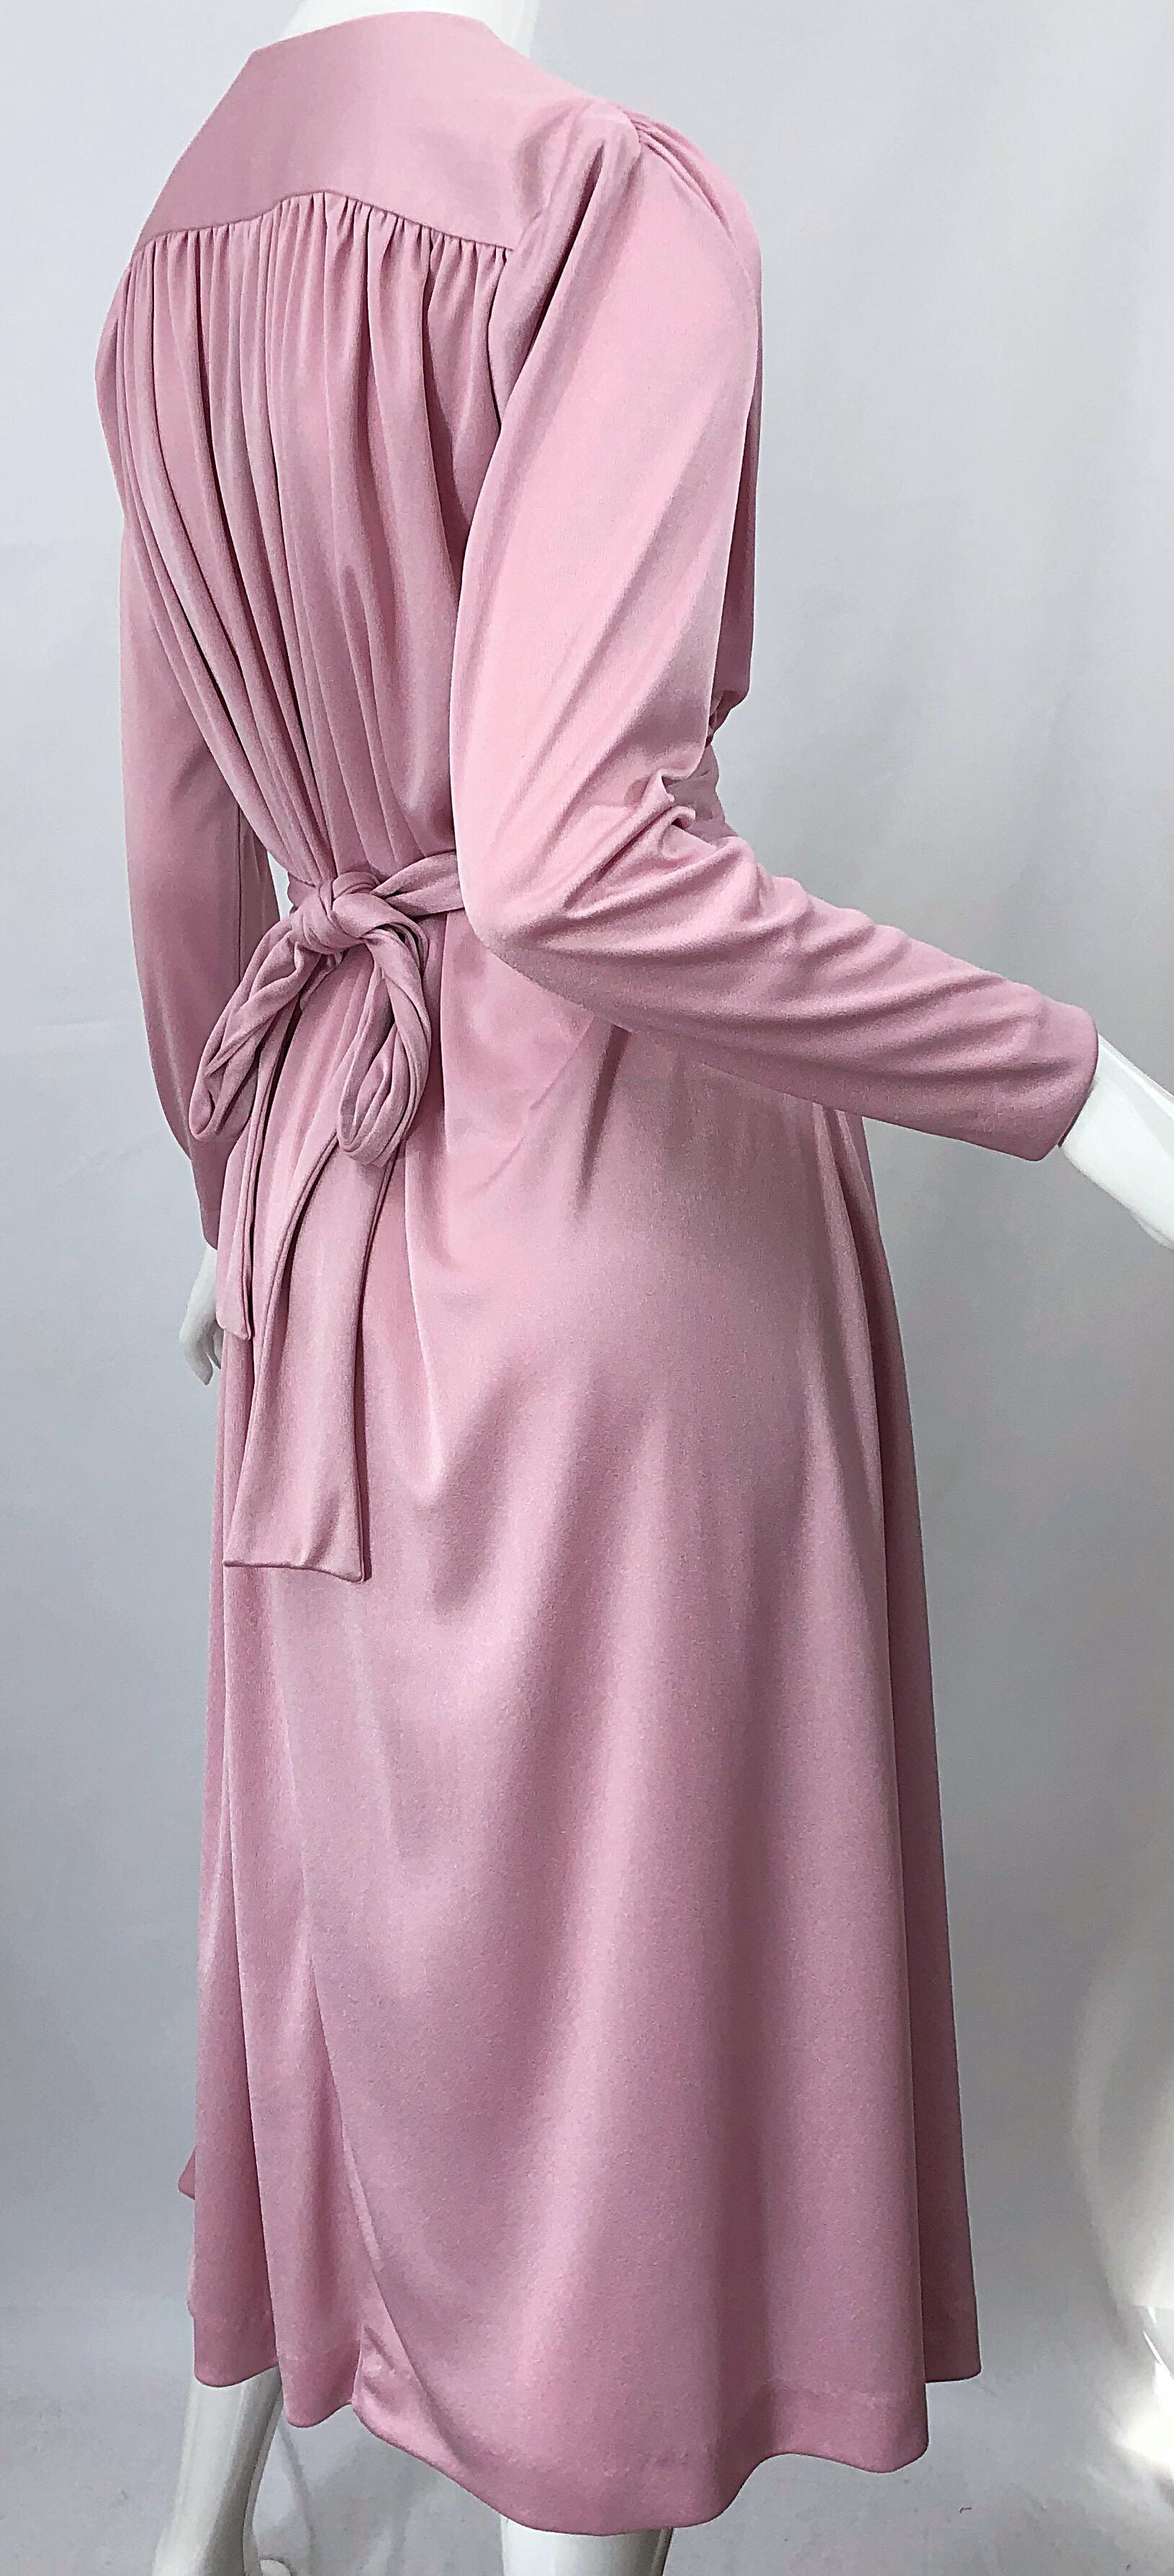 Sensational 1970\u2019s quintessential disco days rhinestone sunburst dress by Joy Stevens knit 70\u2019s dress 70s black dress